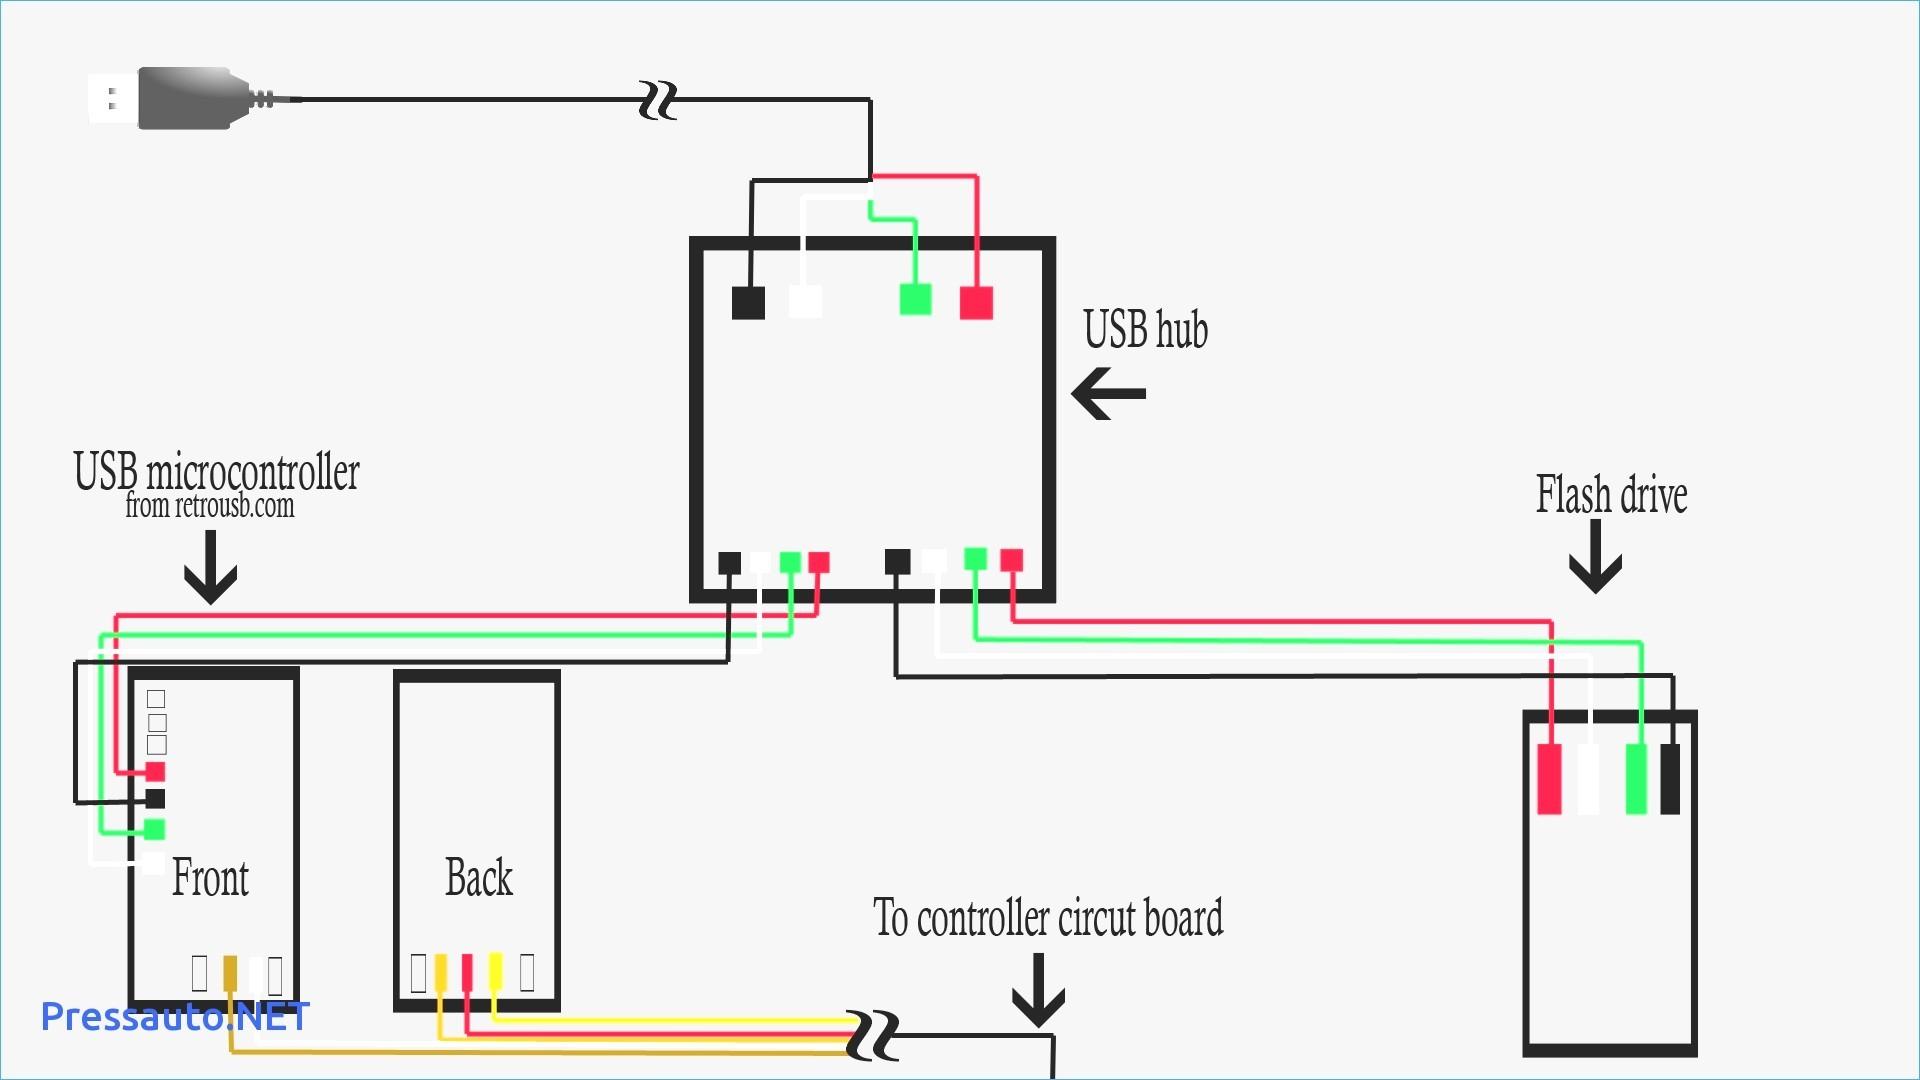 Usb Wiring Diagram Pdf | Electrical Engineering Wiring Diagram on usb circuit schematic diagram, usb 3.0 wiring-diagram, usb pinout diagram, usb header pinout, usb 3.0 pin diagram, usb cable wiring, usb connector schematic, usb motherboard diagram, usb wire diagram,